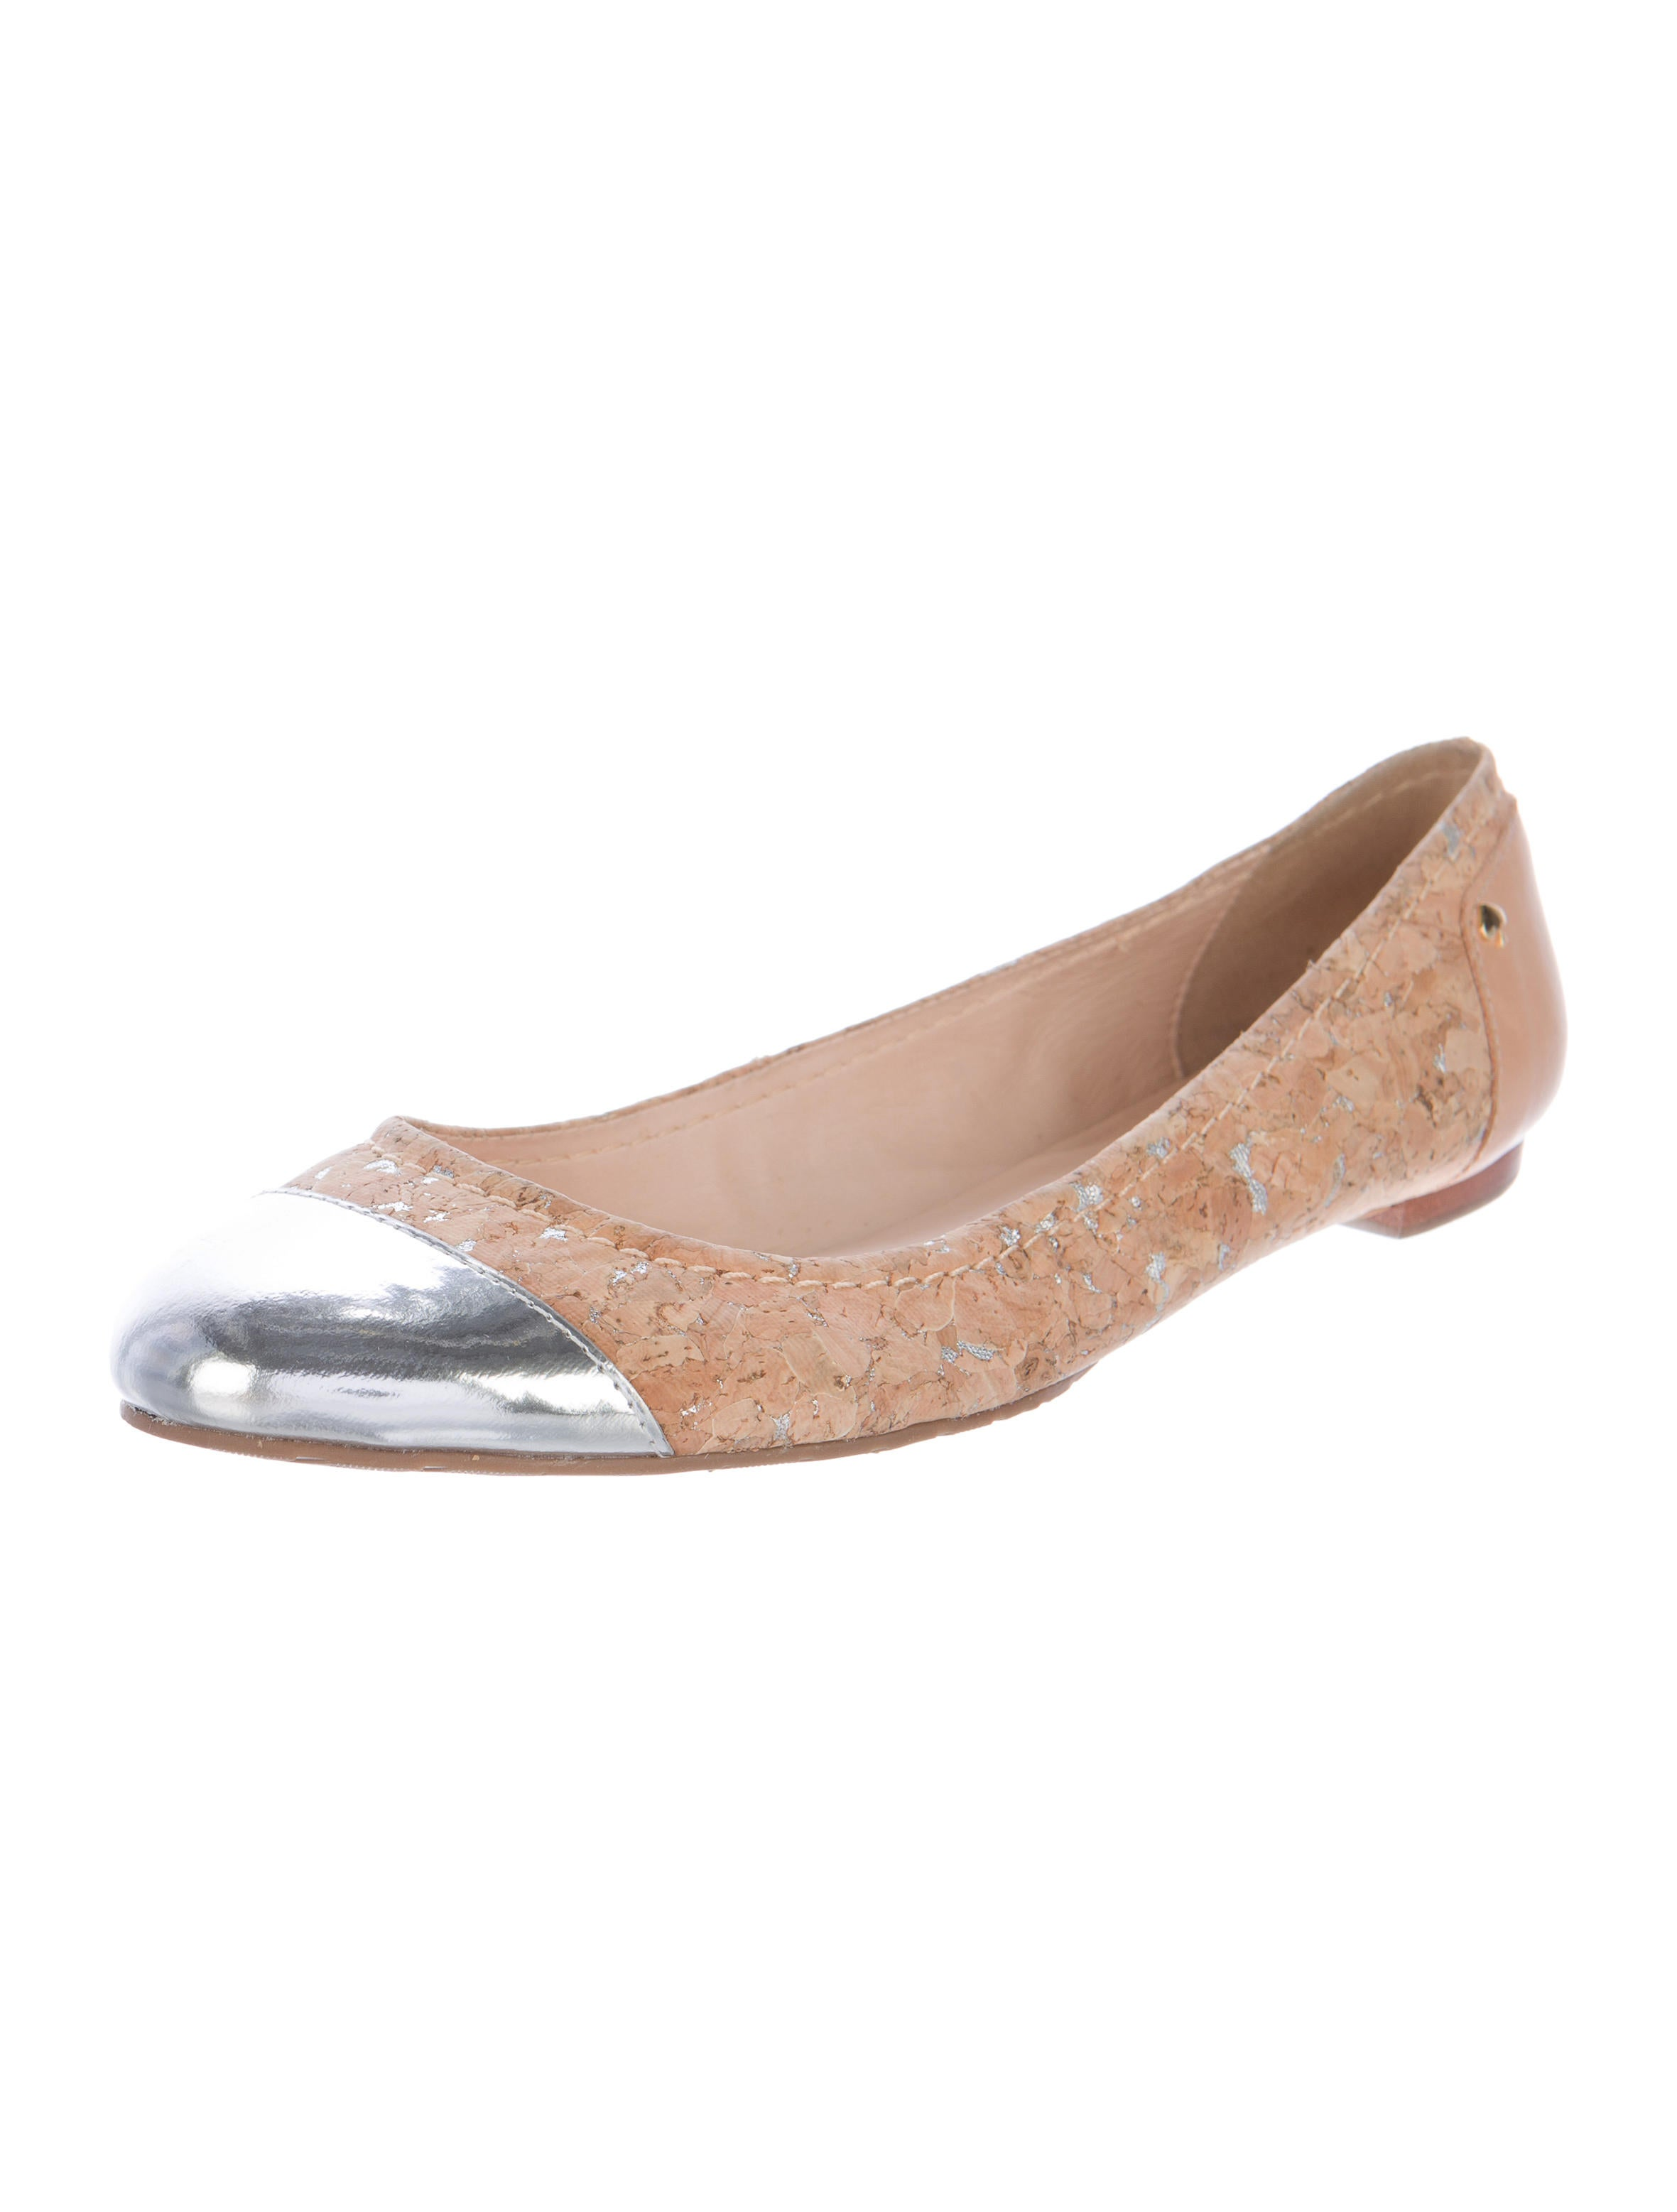 Kate spade new york cork cap toe flats shoes wka54181 for Kate spade new york flats